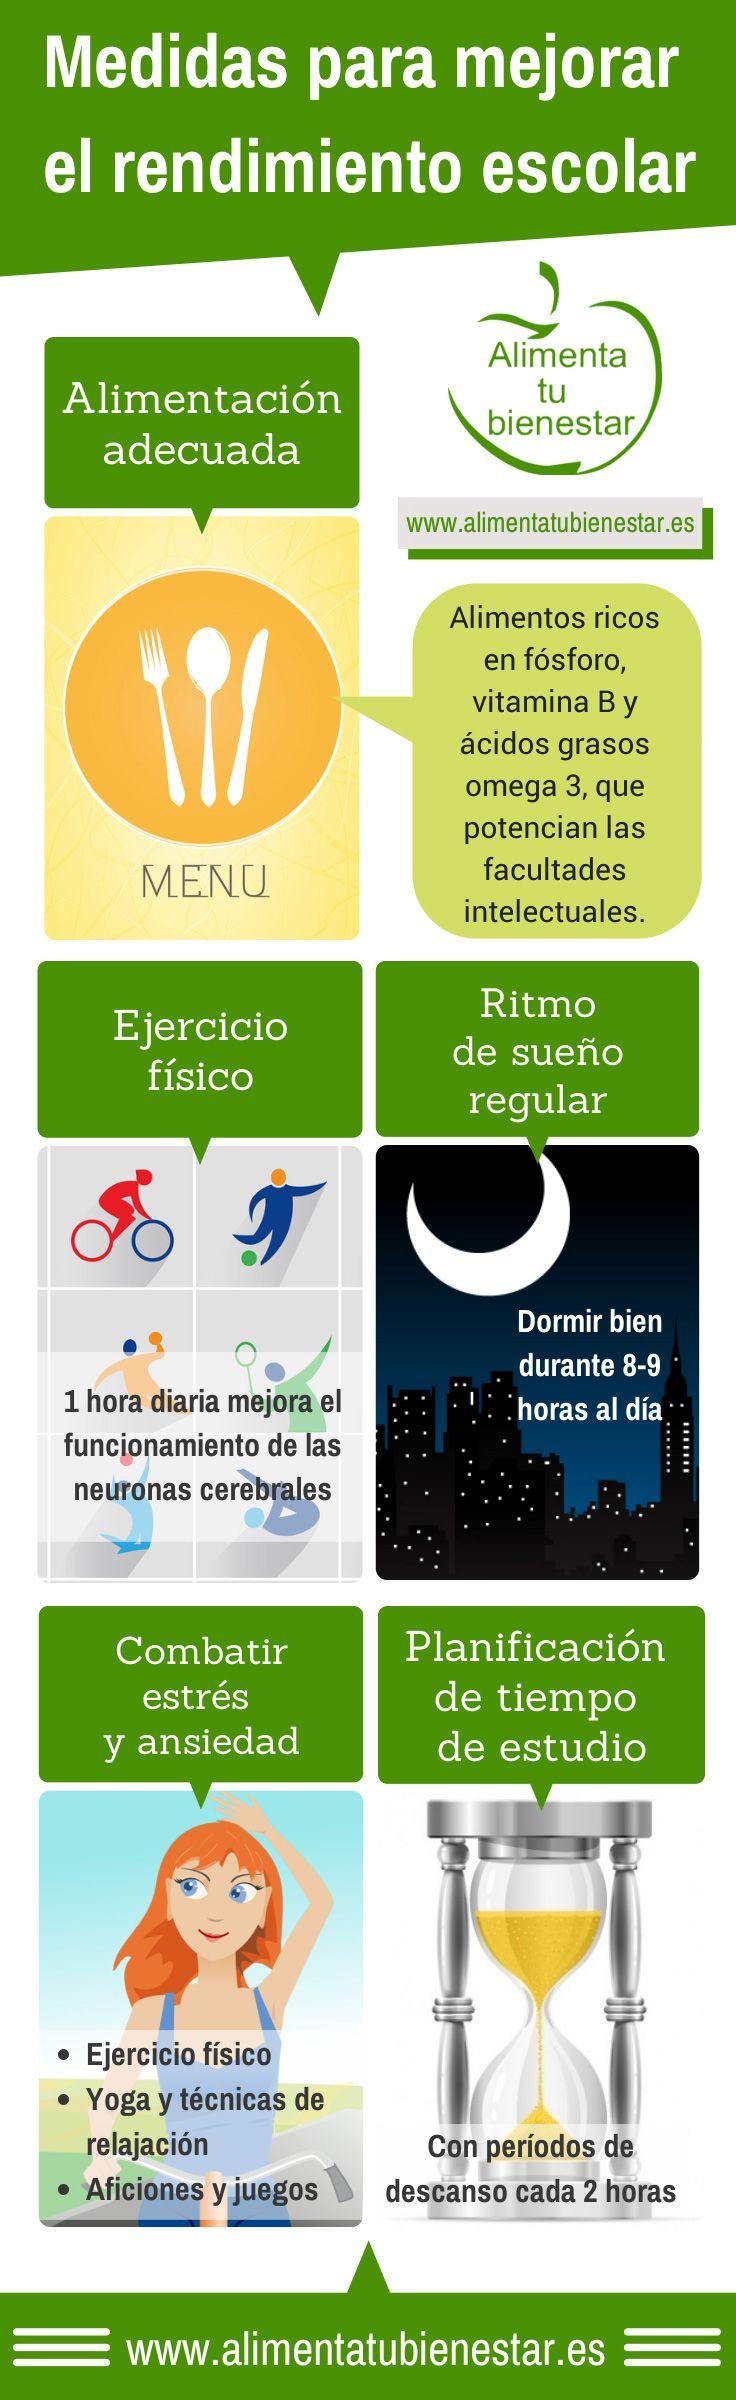 #Infografia Medidas fundamentales para mejorar el #RendimientoEscolar #infantil